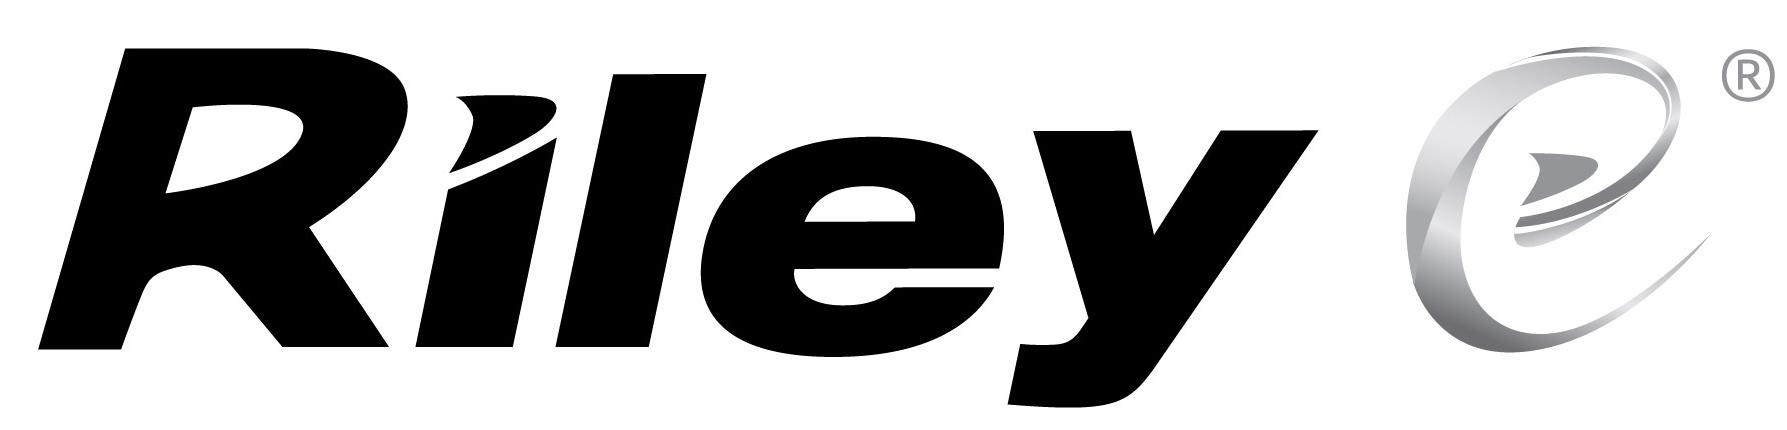 RILEY Logo Design 1h